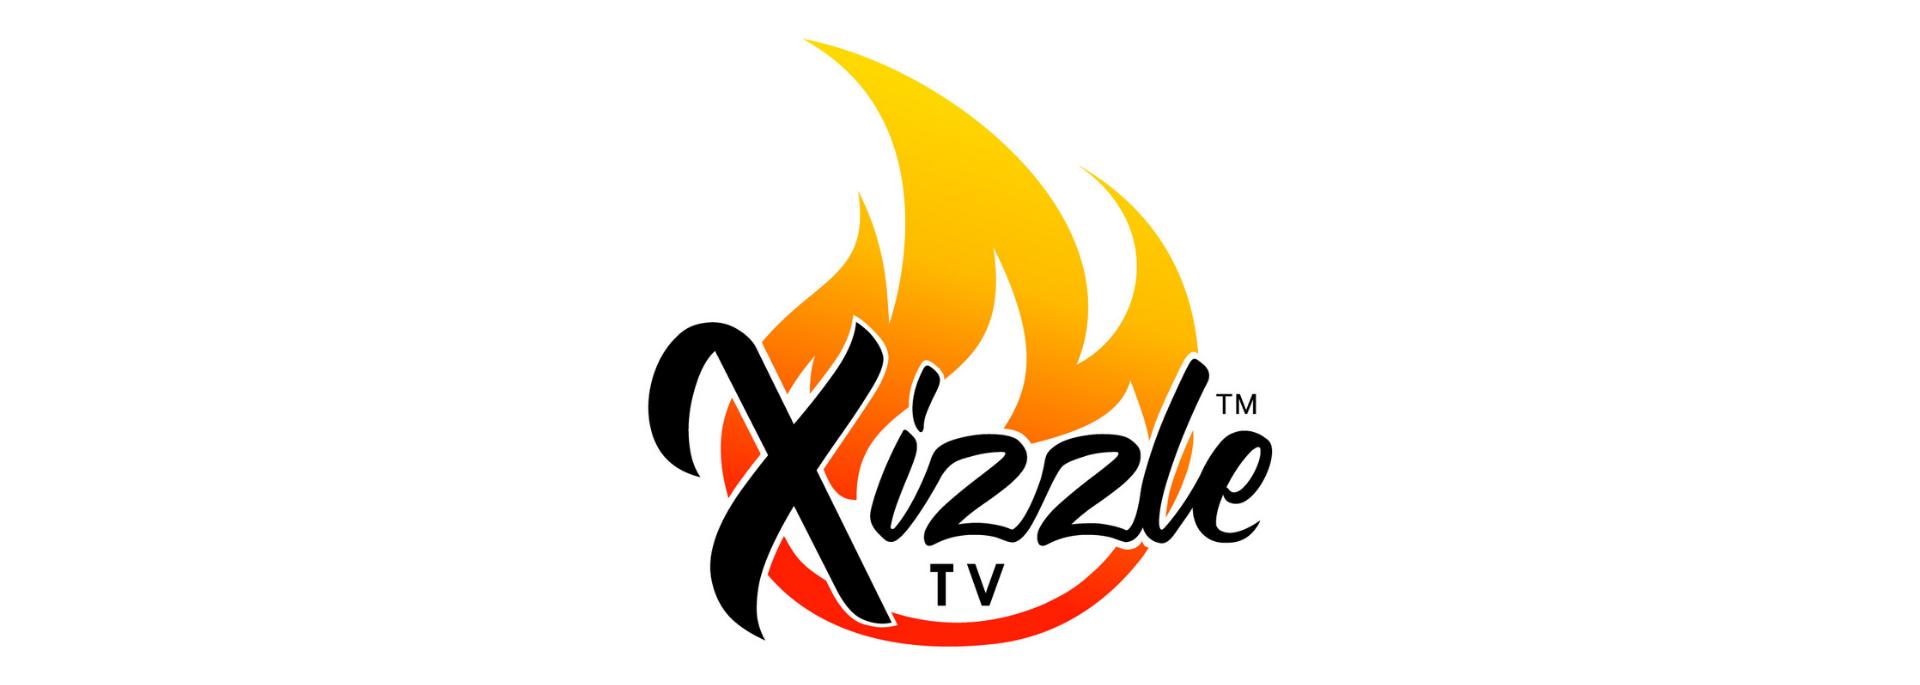 #Xizzle TV channel